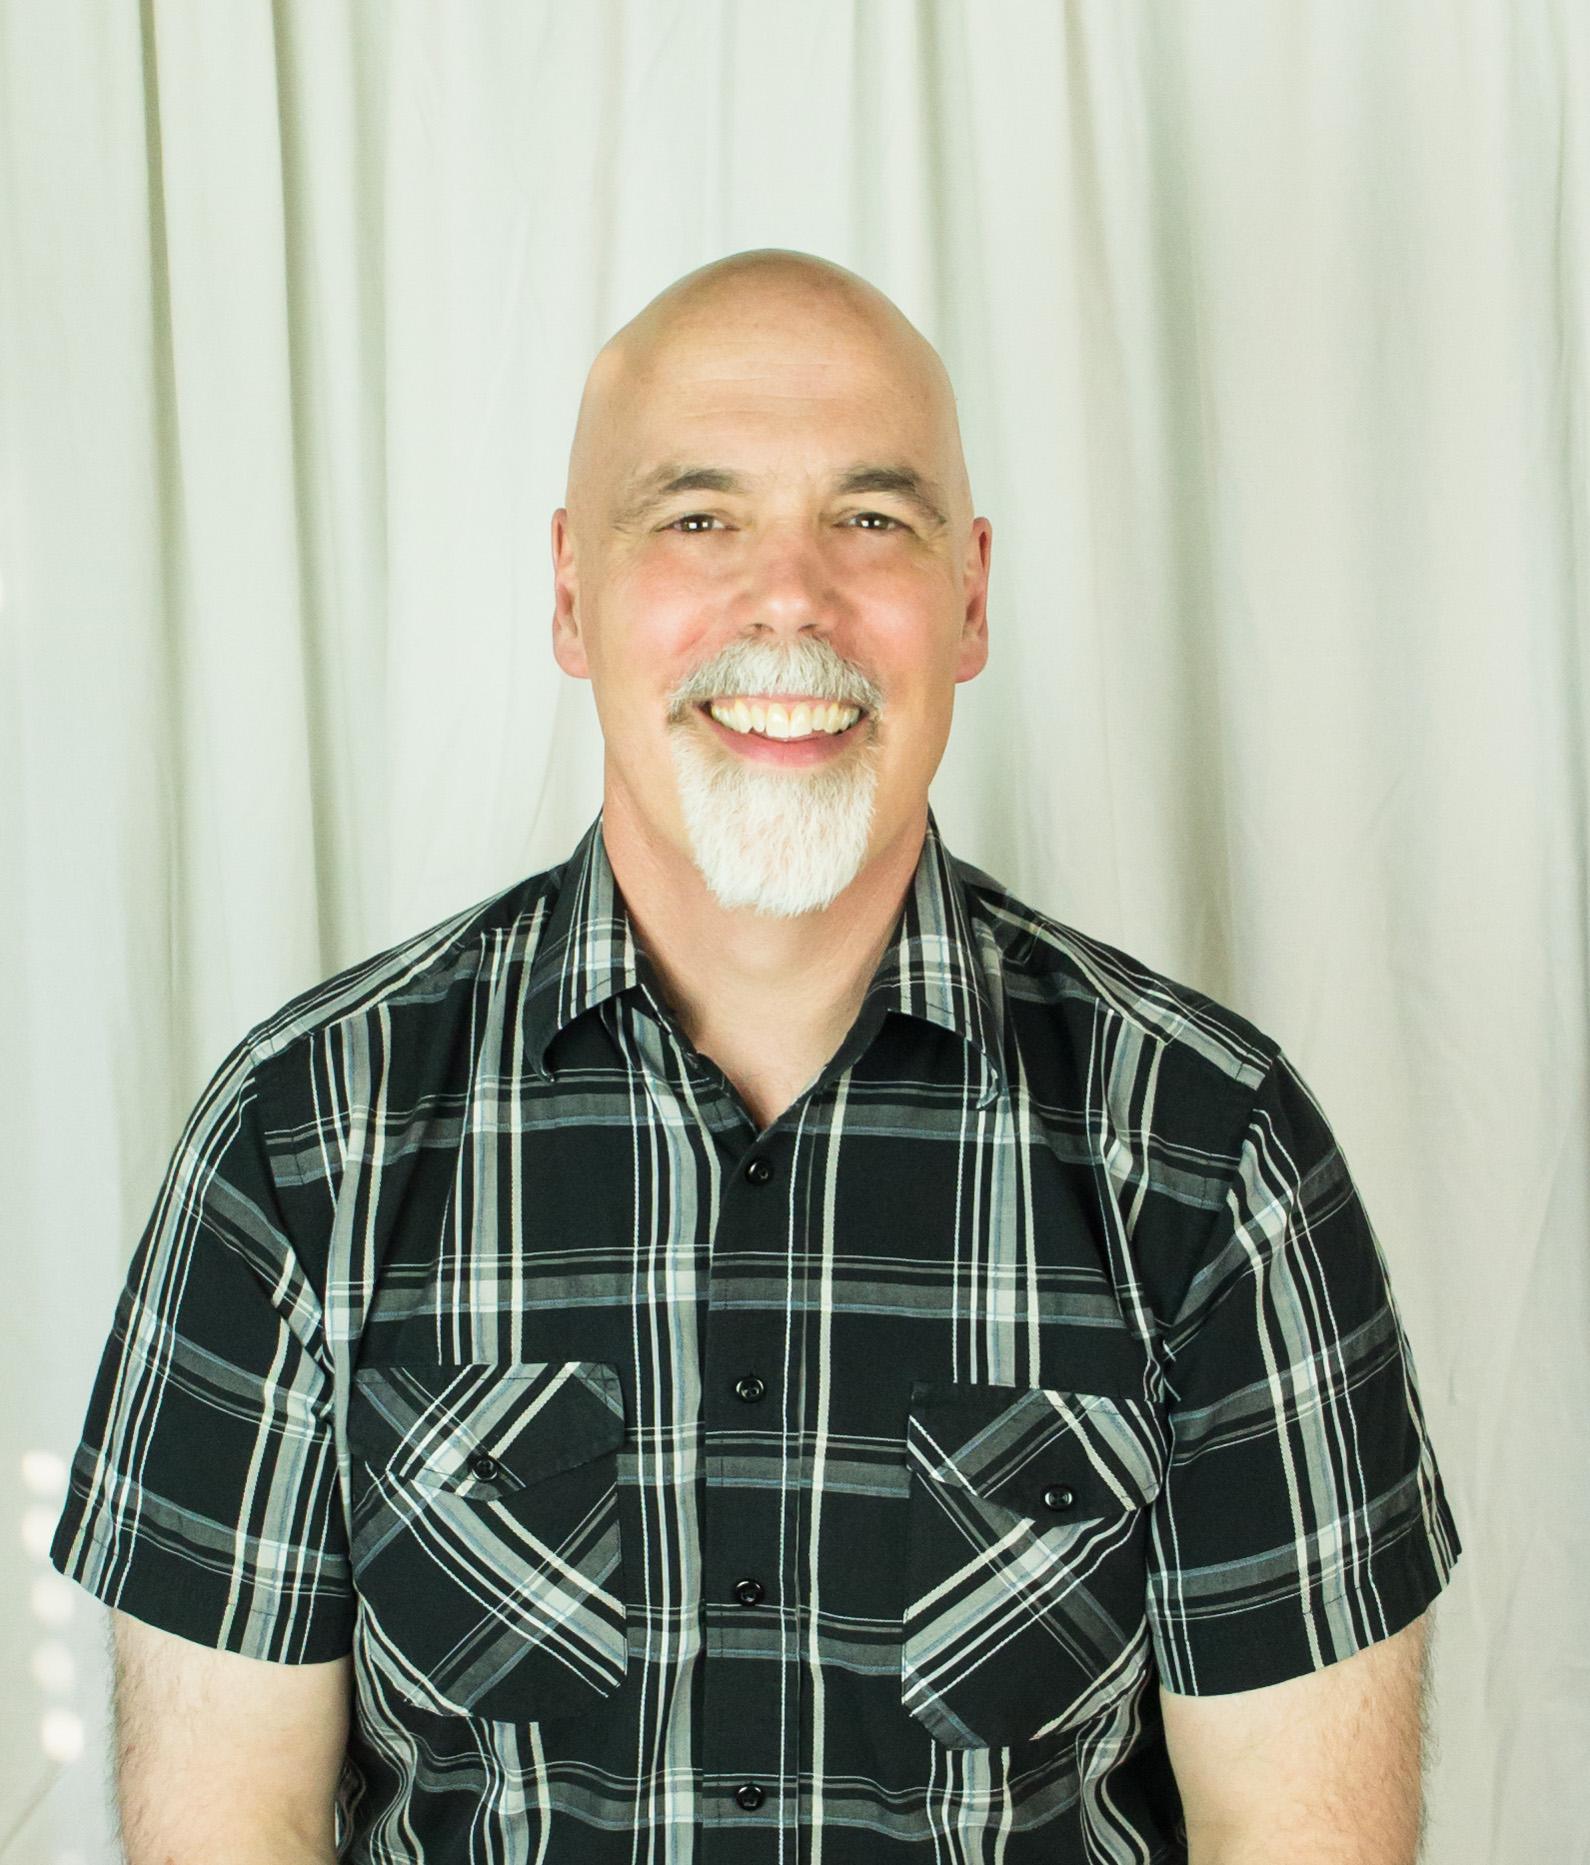 John Geiter